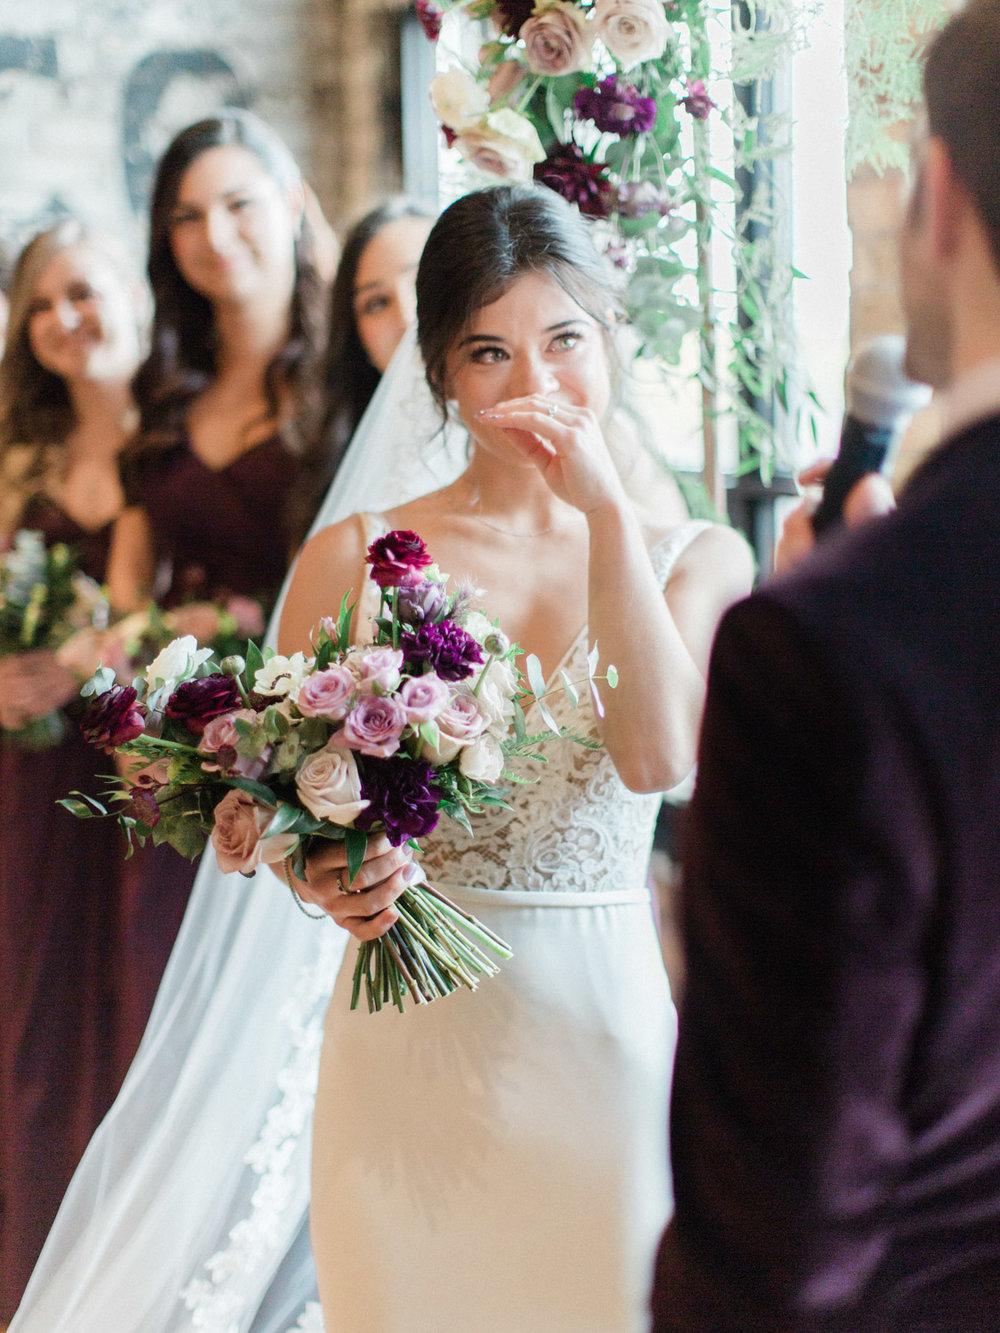 corynn-fowler-photography-toronto-collingwood-destination-wedding-photographer-473.jpg